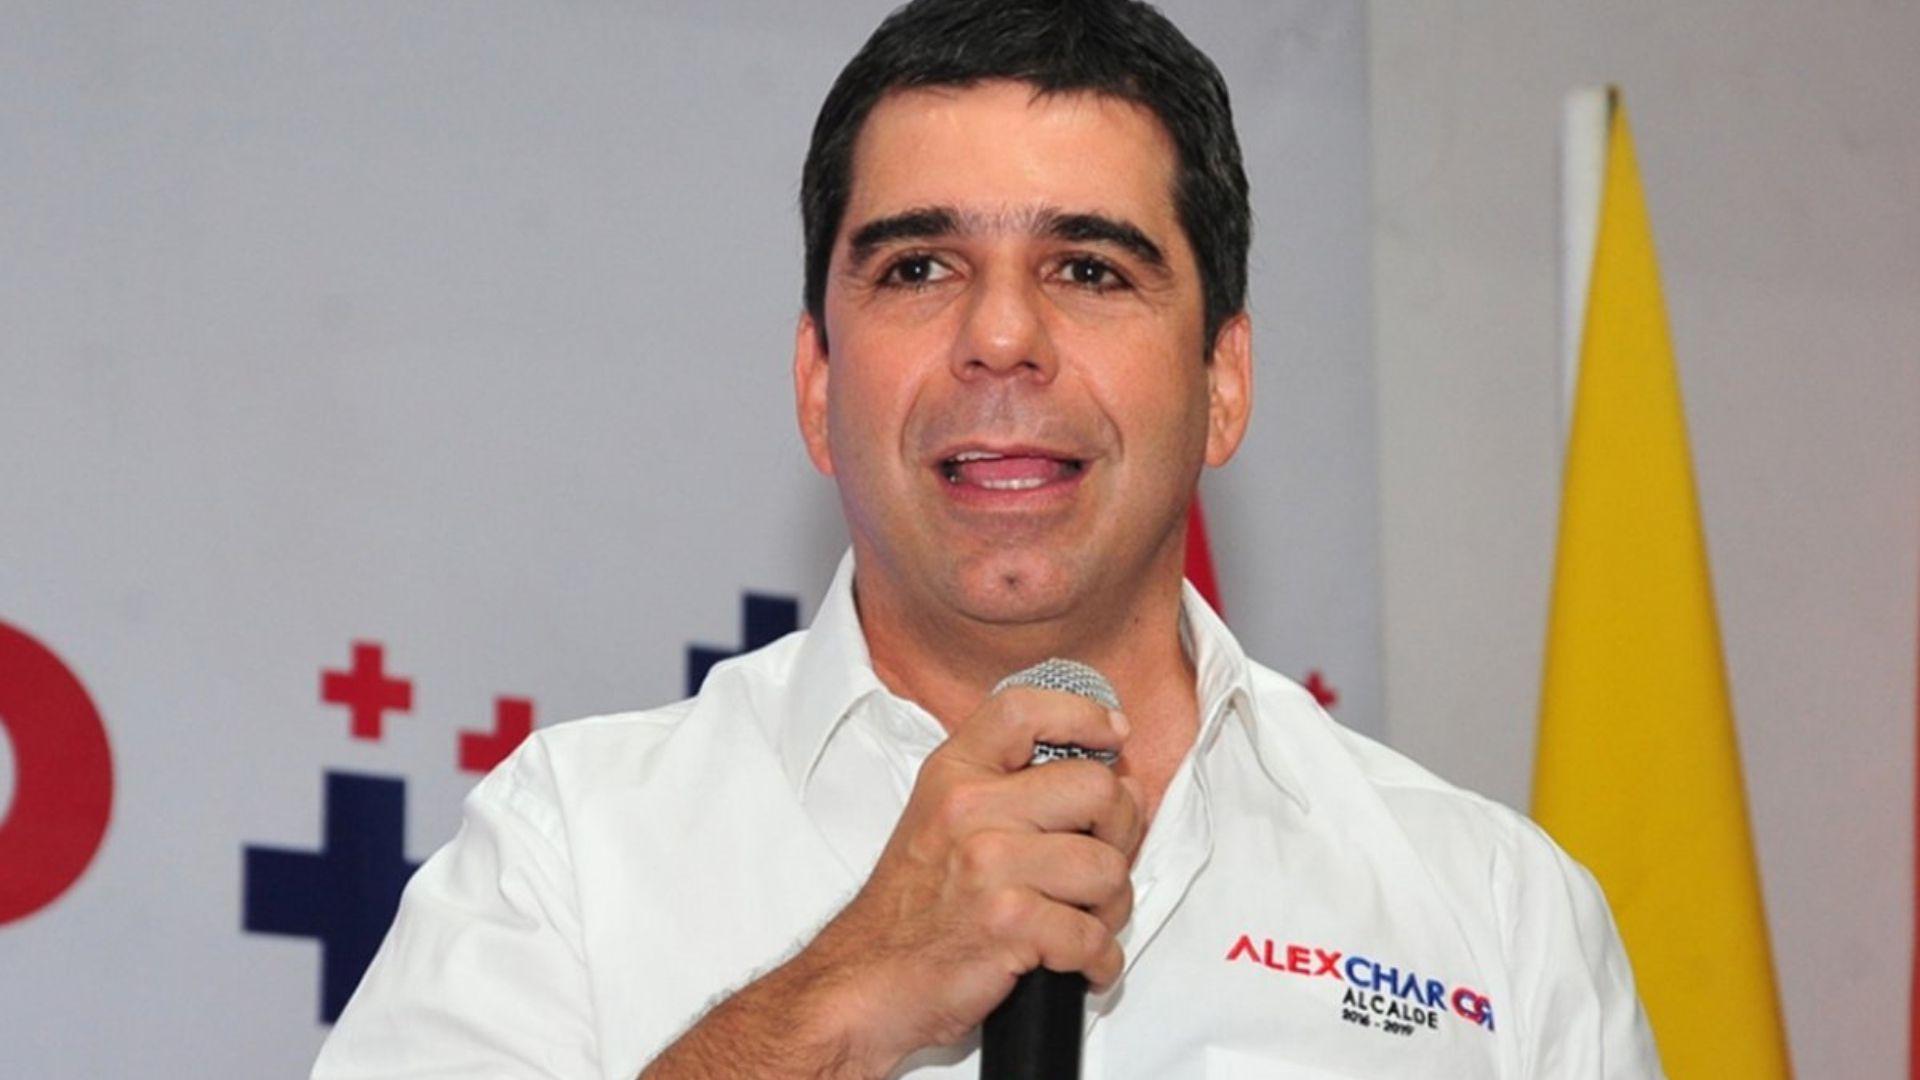 Alex Char